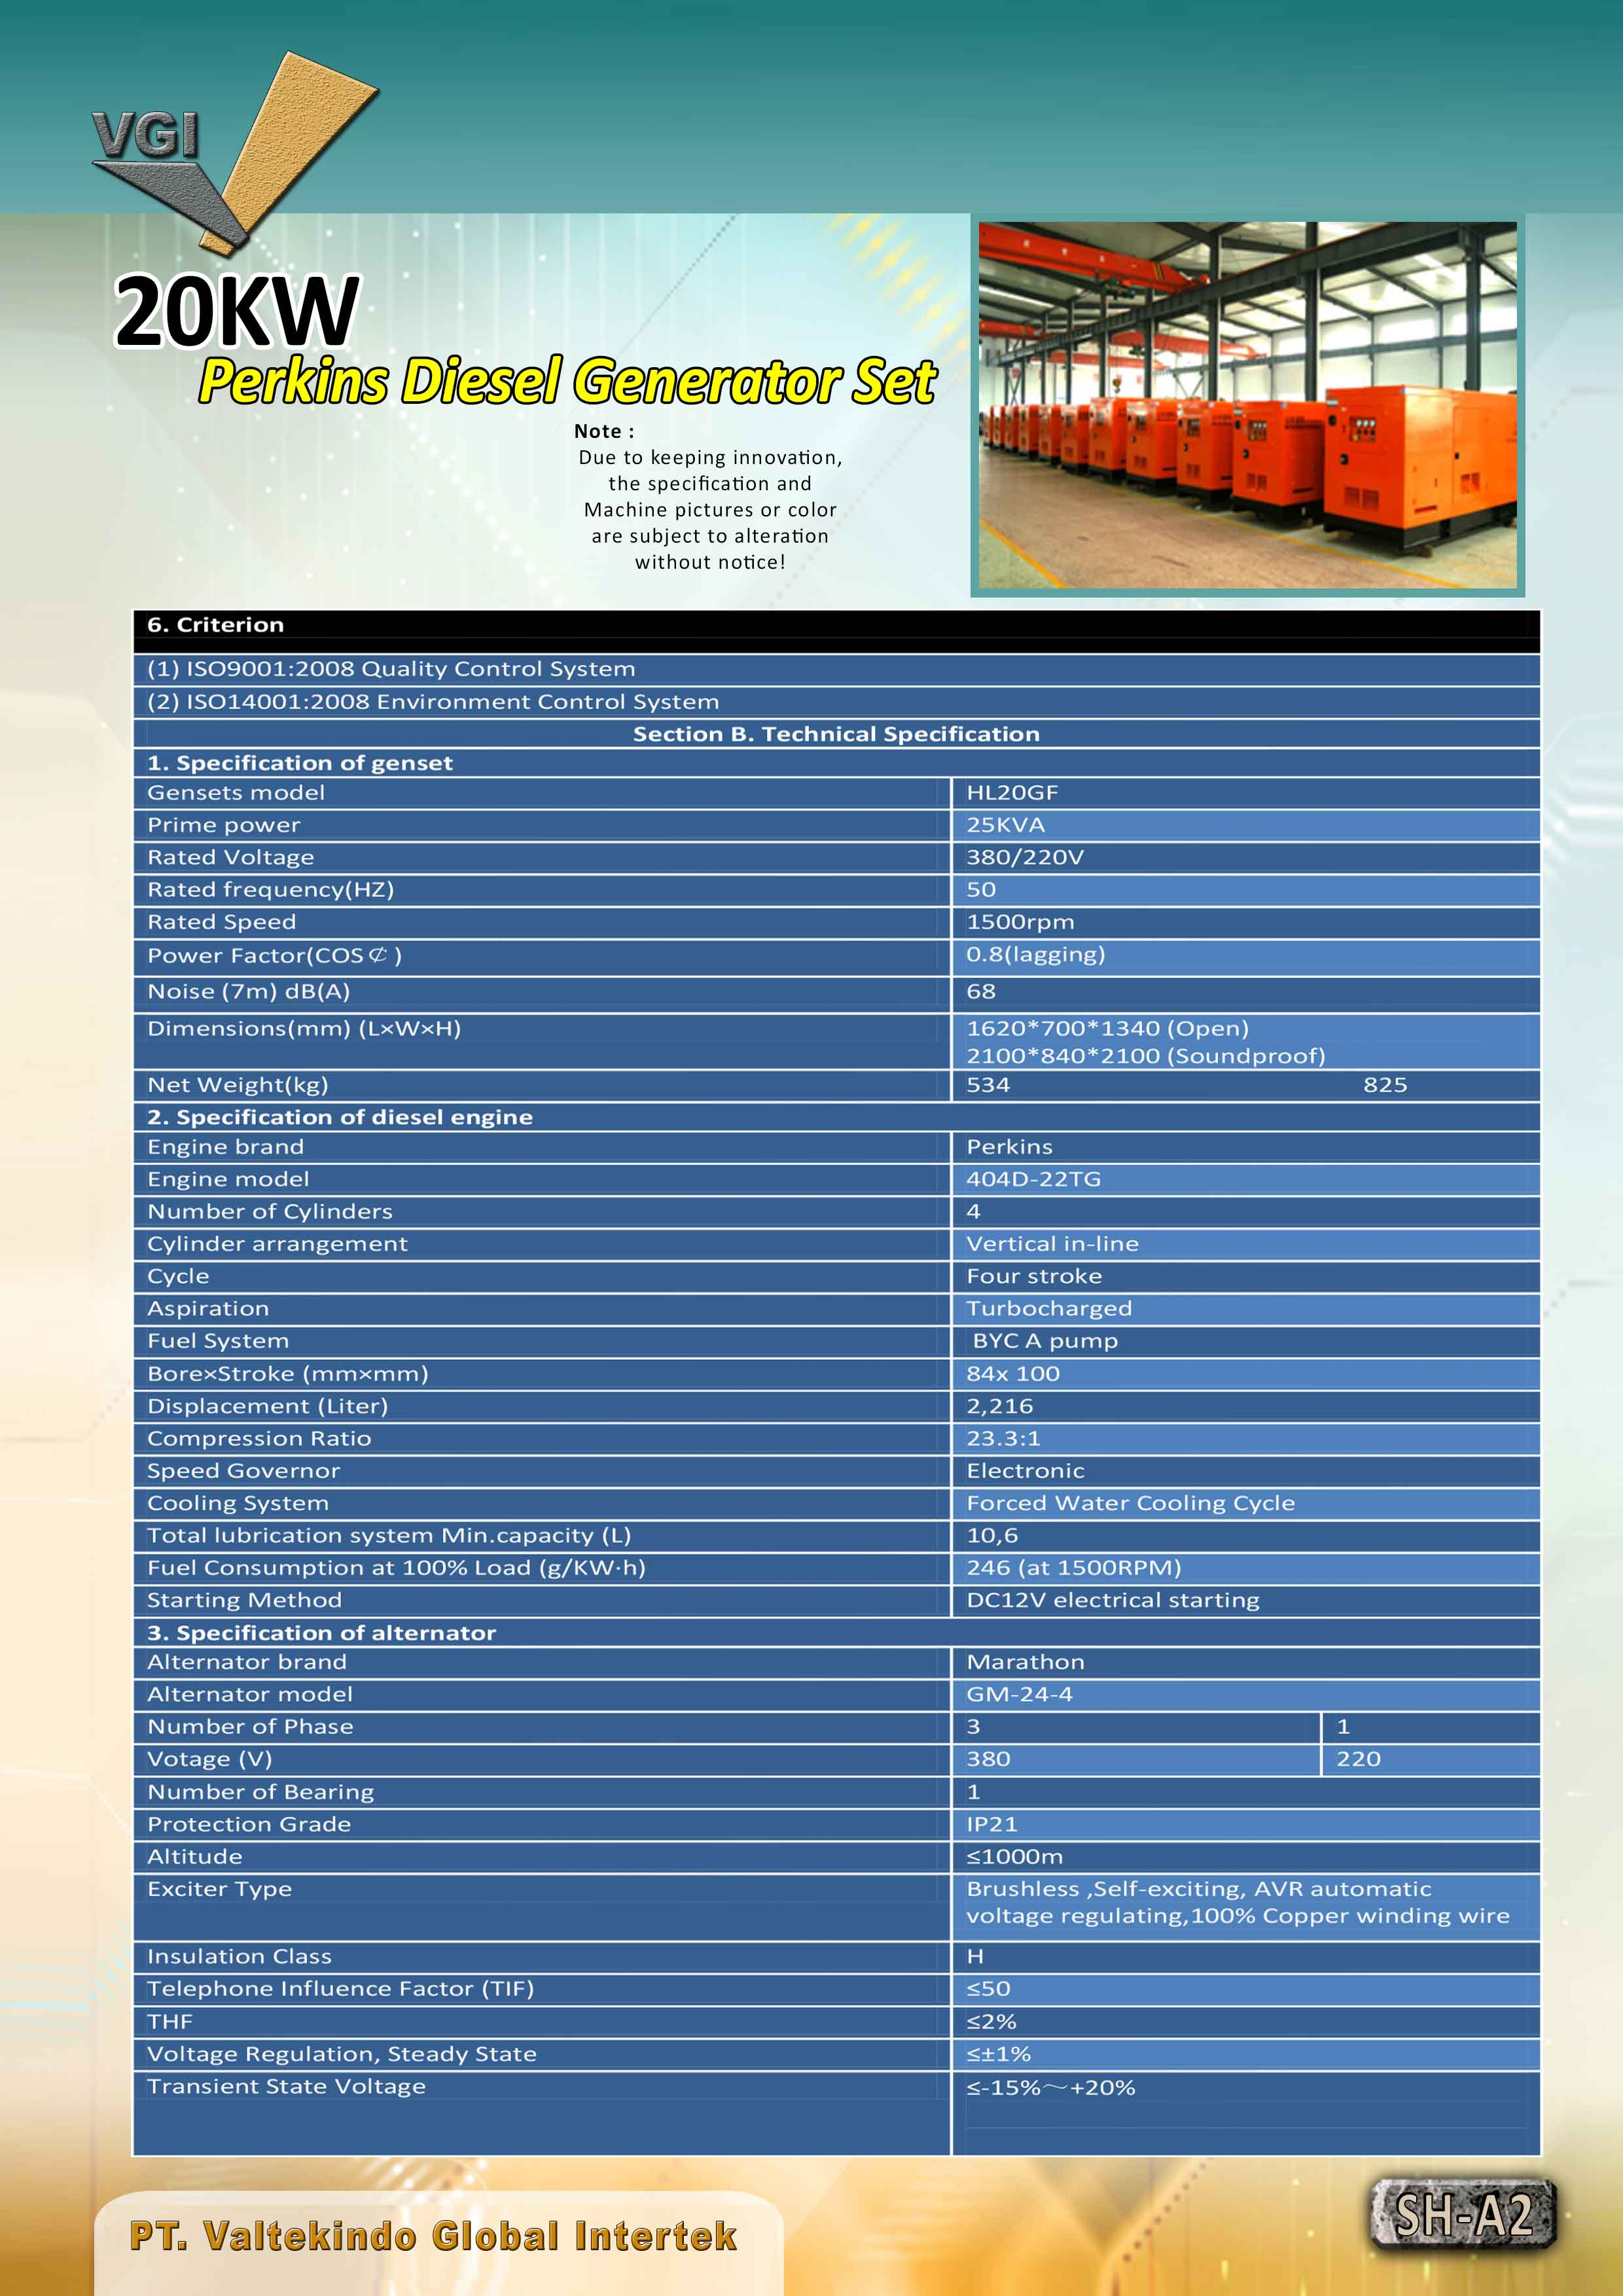 jual mesin, harga mesin, jual mesin bandung, distributor mesin, jual mesin karet, daur ulang karet, daur ulang plastik, mesin pertanian 20 KW Perkins Diesel Generator Set 20 KW Perkins Diesel Generator Set